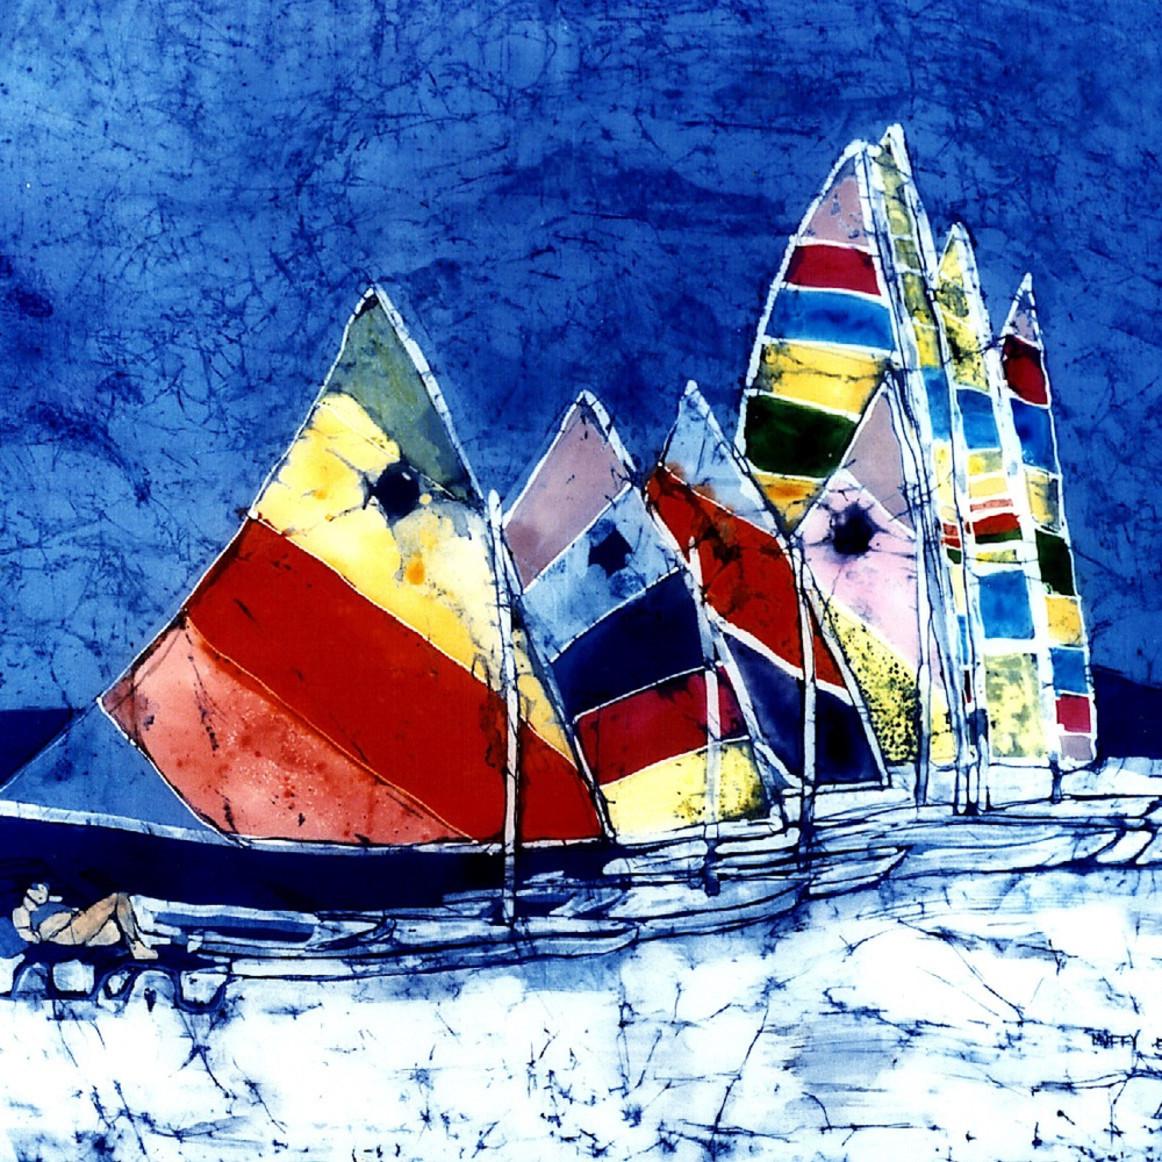 Mcg 03 sailboat beach mbhjtm